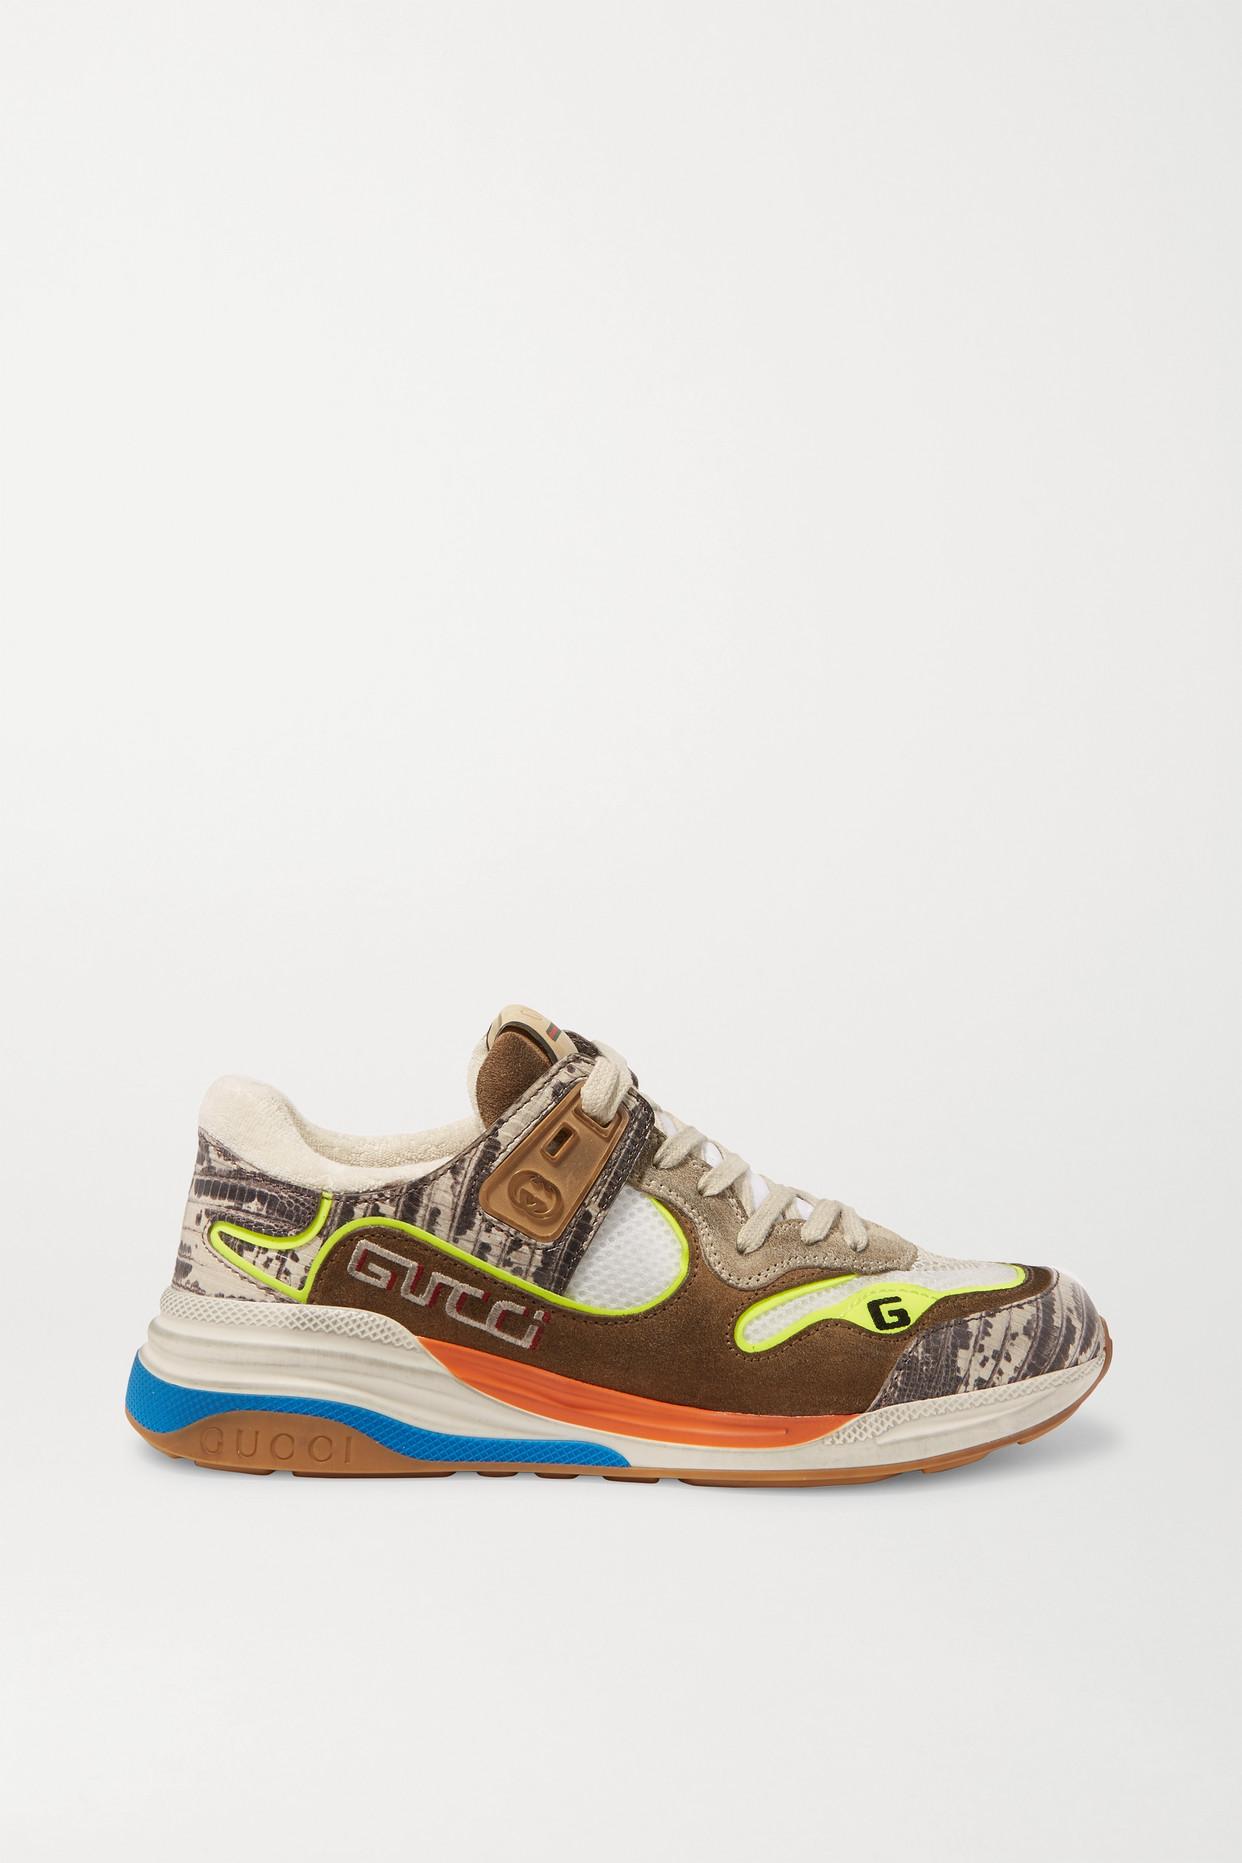 GUCCI - Ultrapace 仿蛇纹皮革网眼仿旧绒面革运动鞋 - 棕色 - IT40